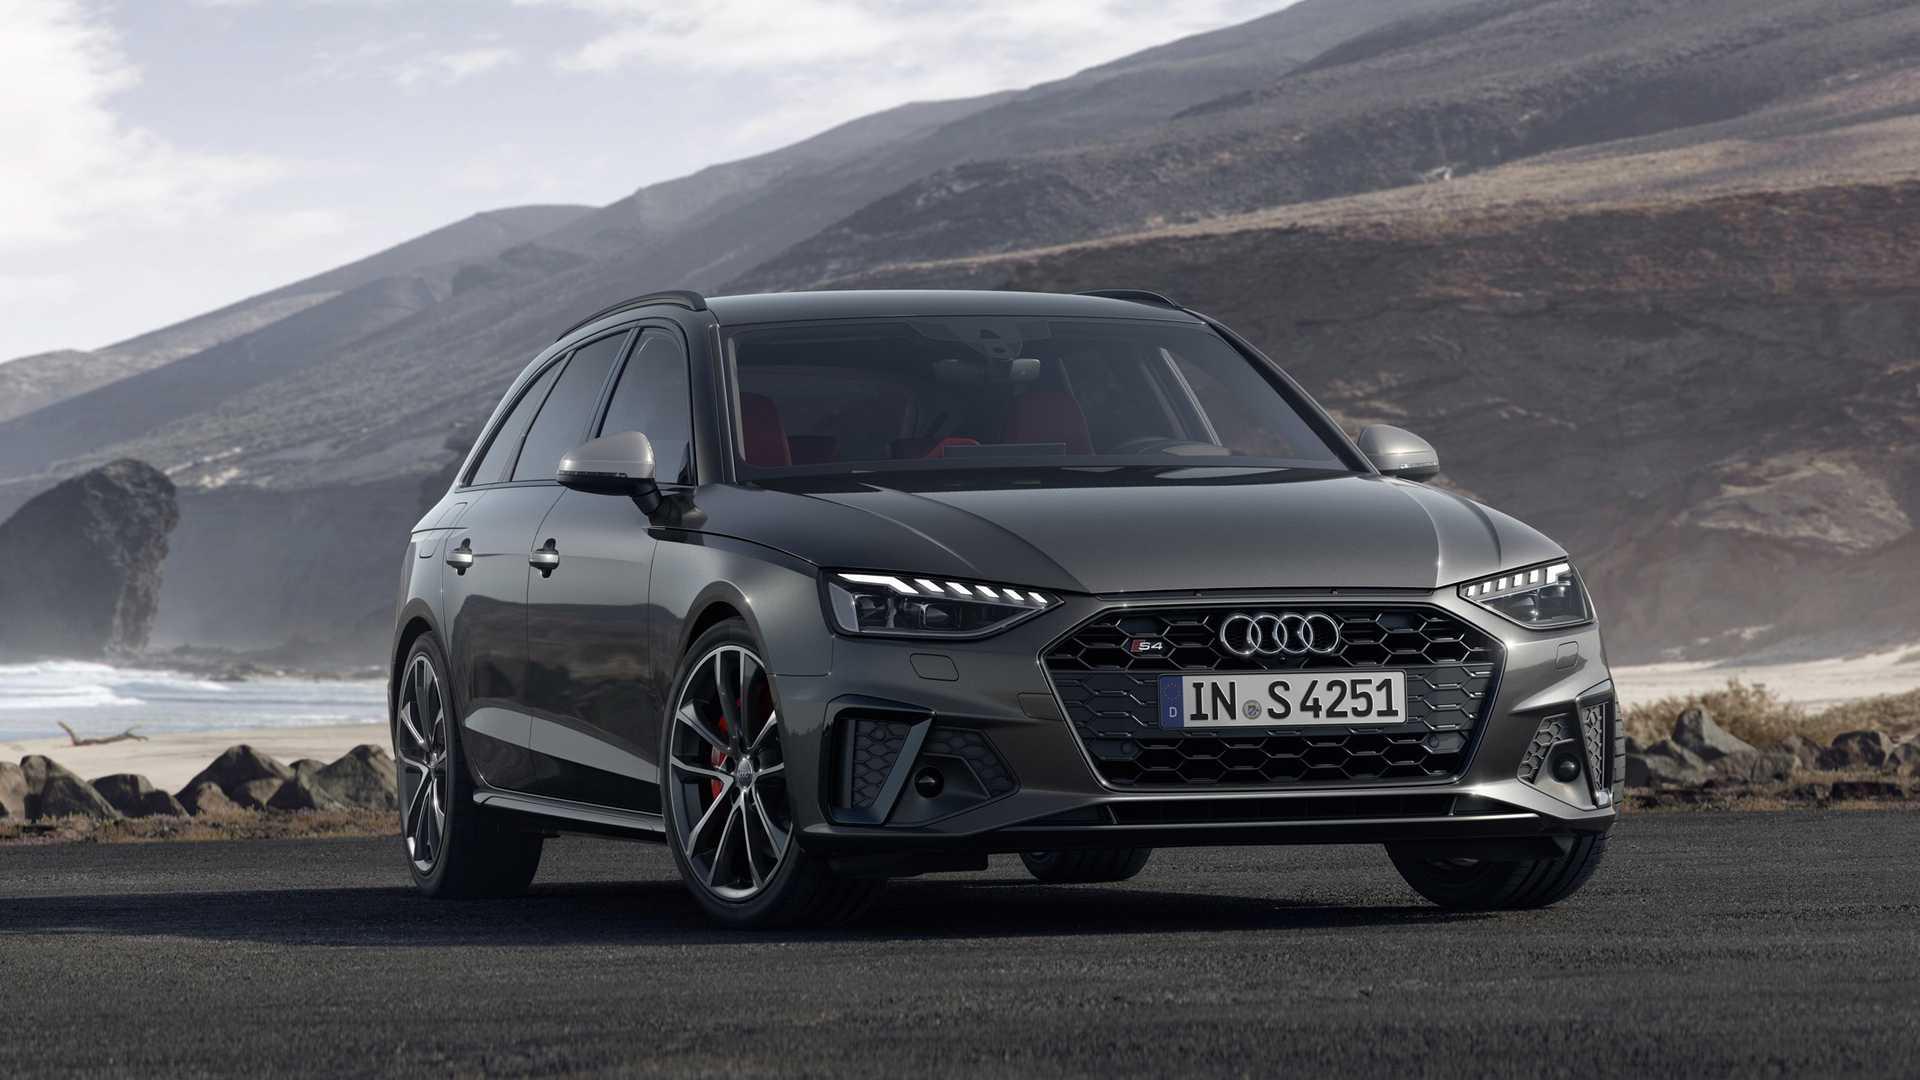 2020 Audi S4 Avant TDI (Color: Daytona Gray) Front Three-Quarter Wallpapers (1)